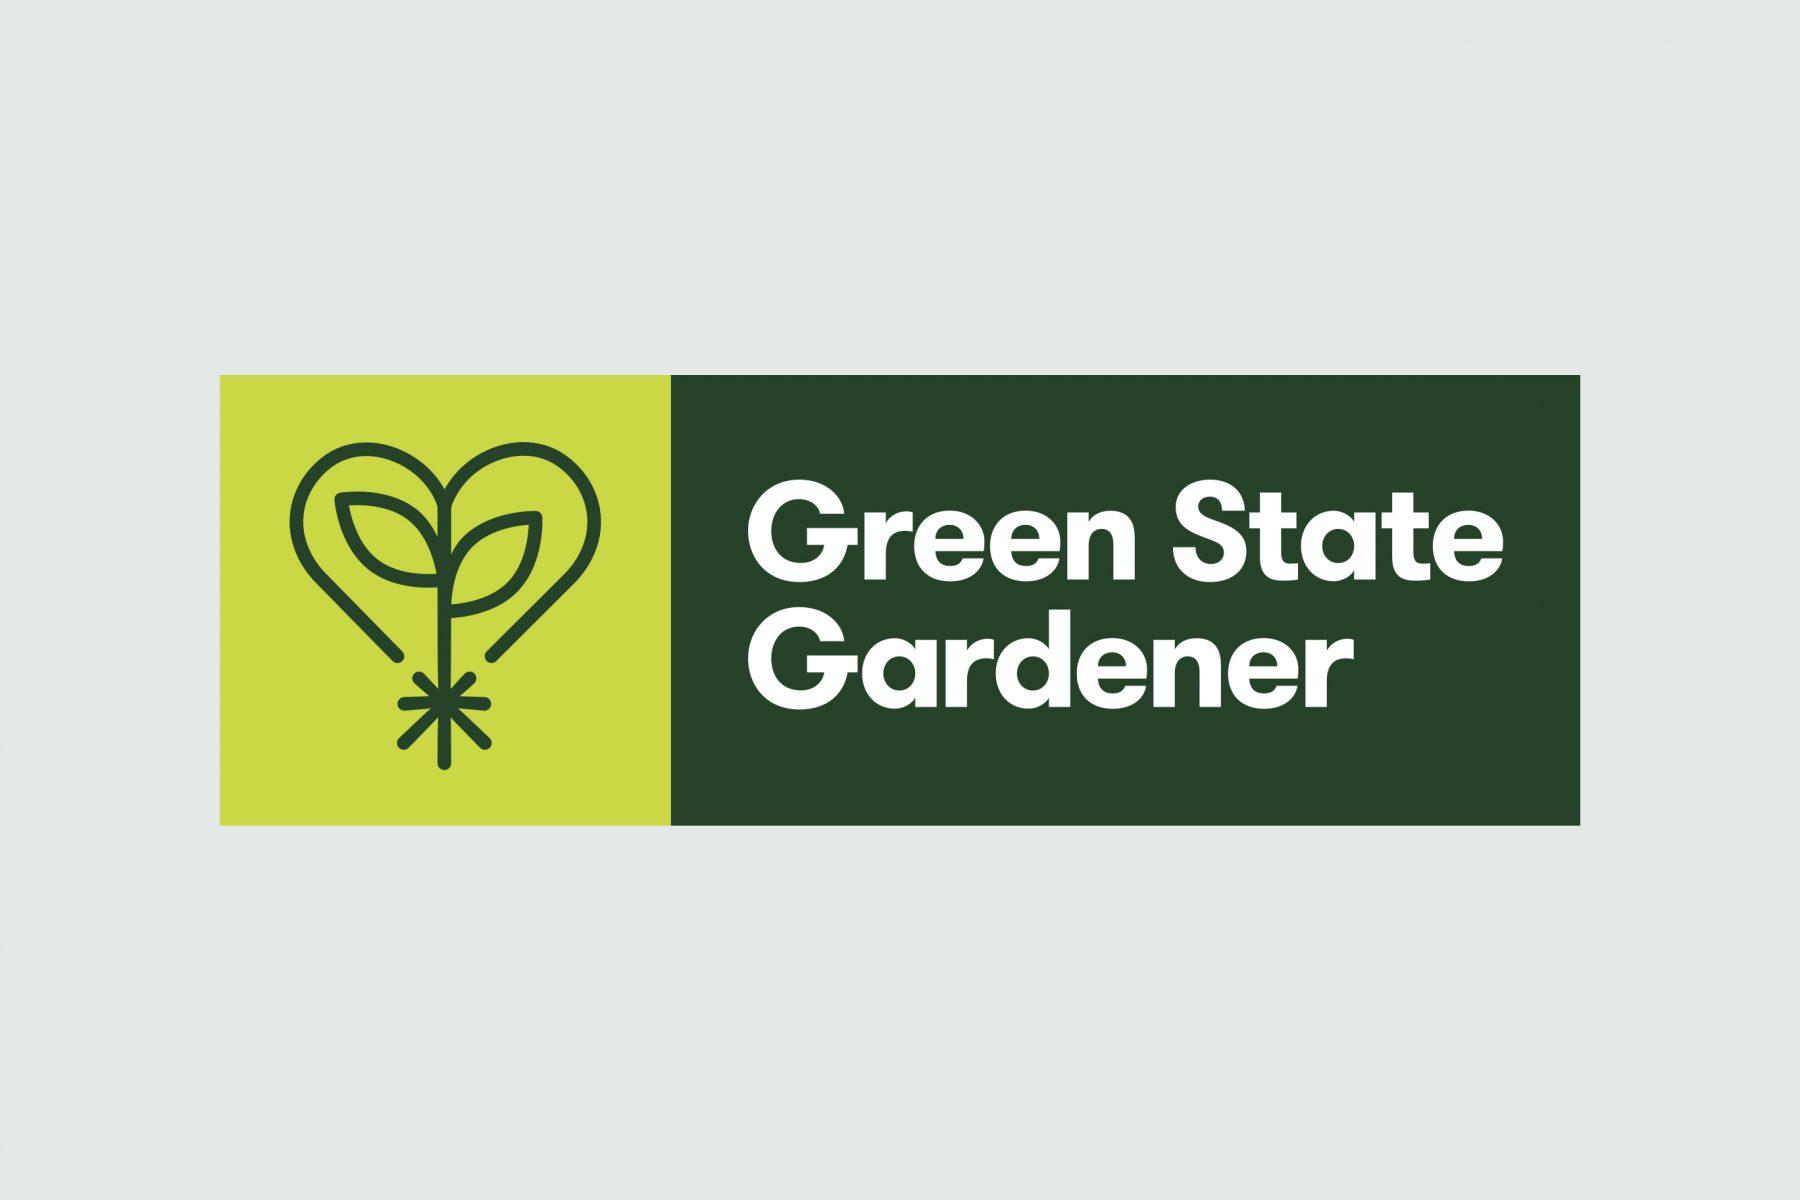 Green State Gardener Brand Identity